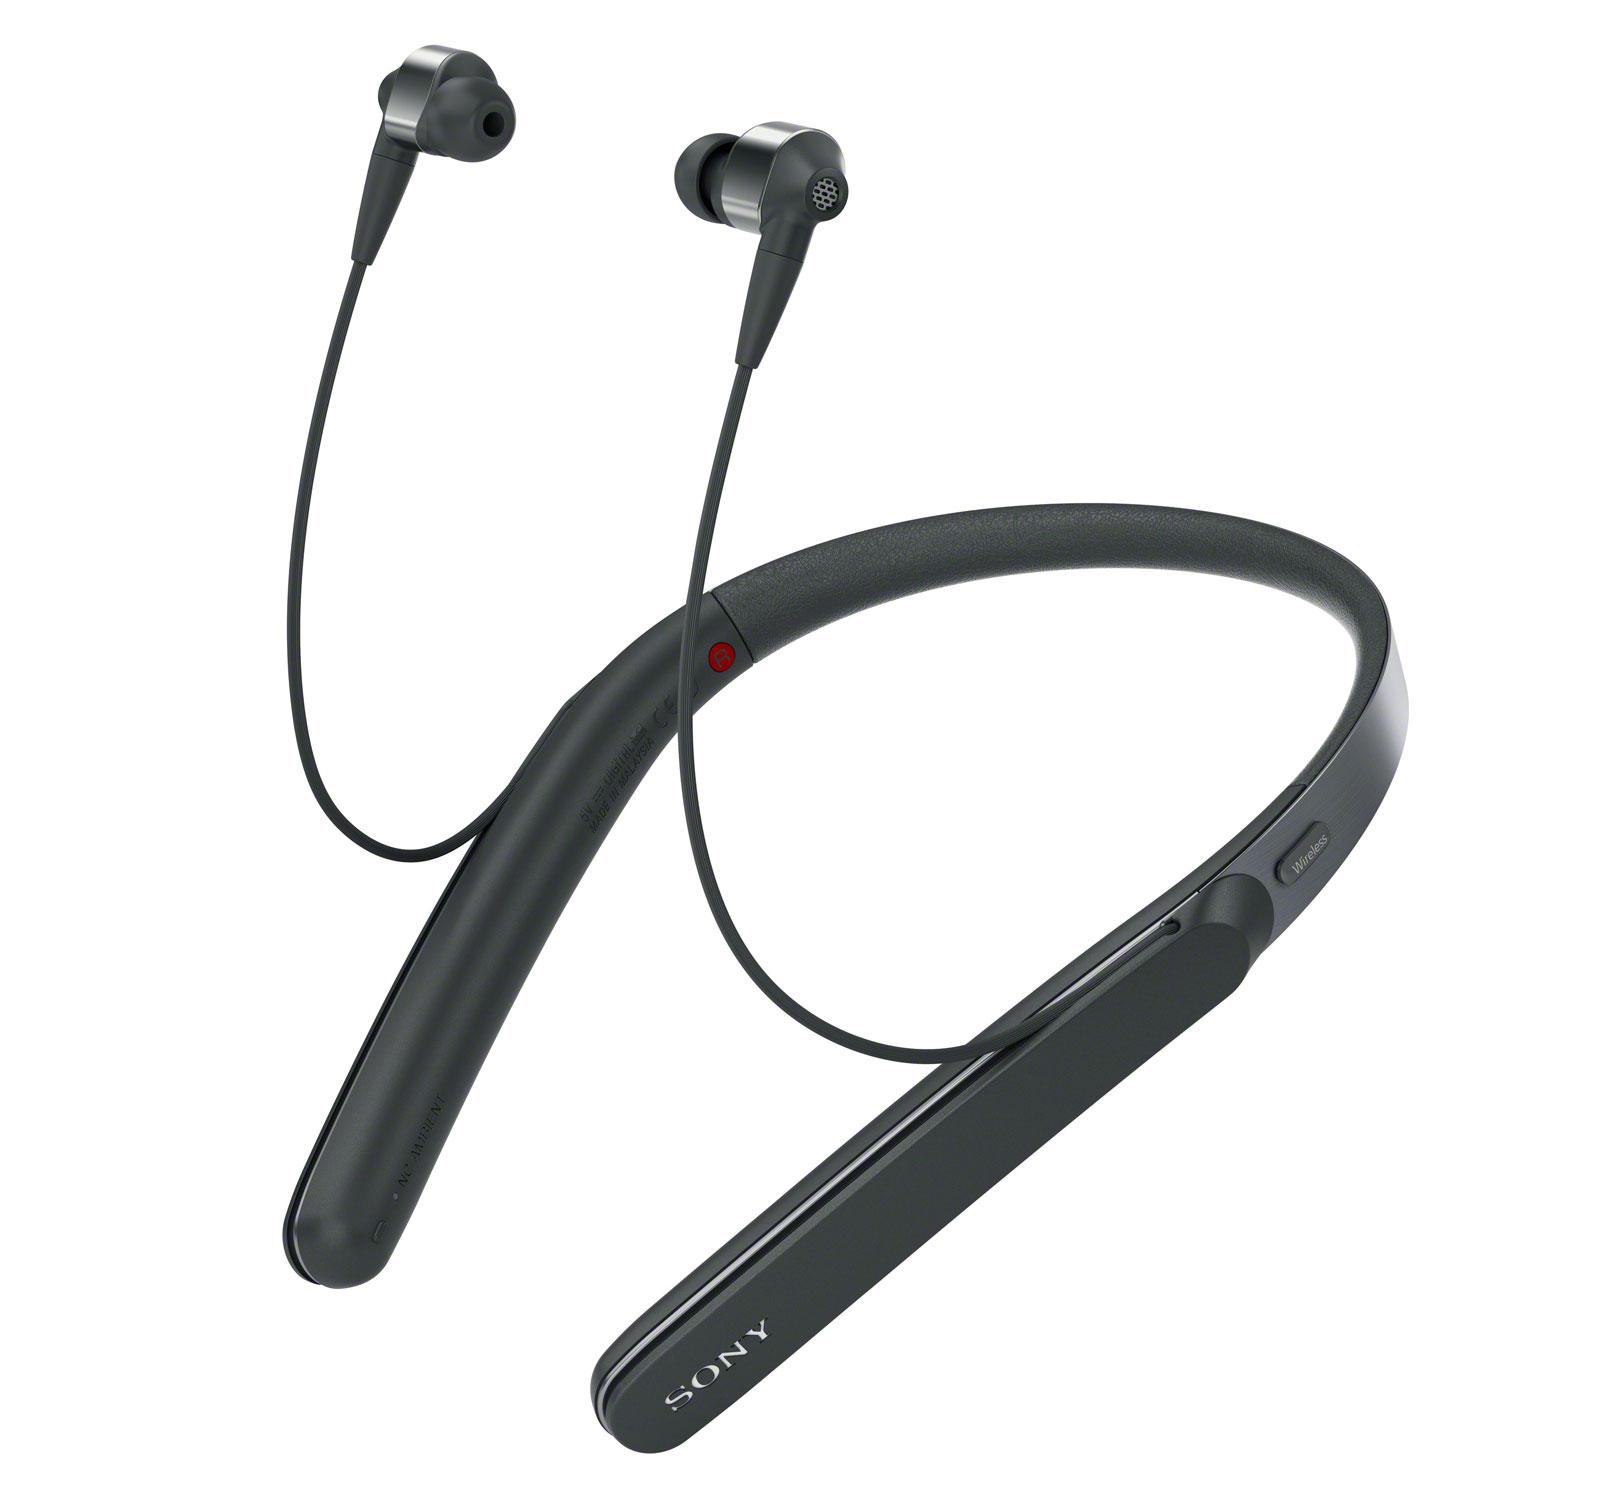 b342bd3efd7 Sony Wireless Premium Noise Canceling Headphones (Black) - Walmart.com